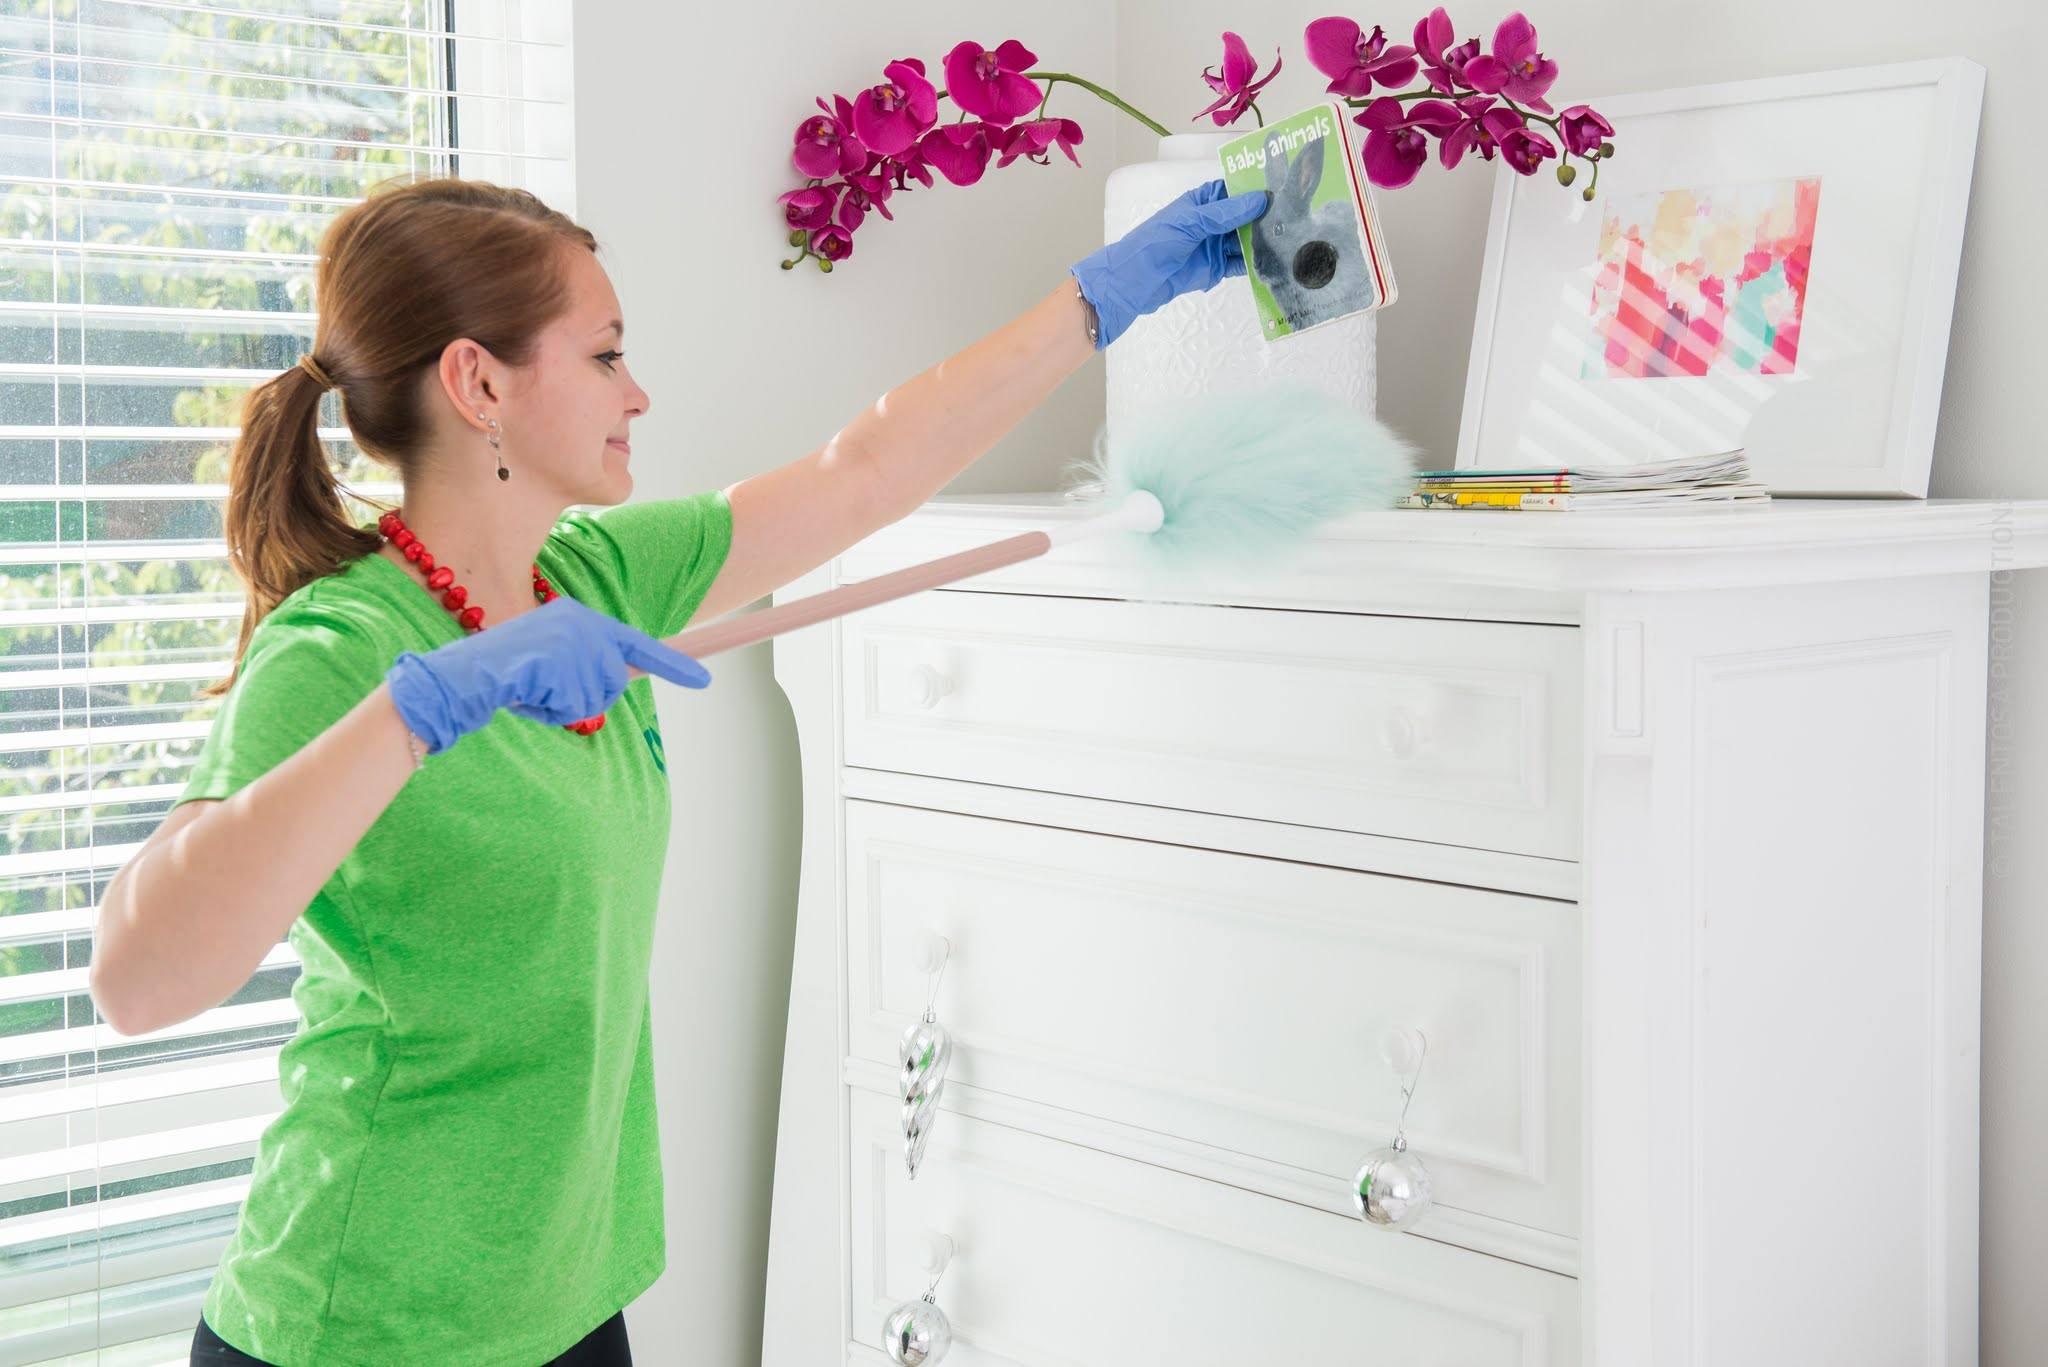 Services de nettoyage approfondi